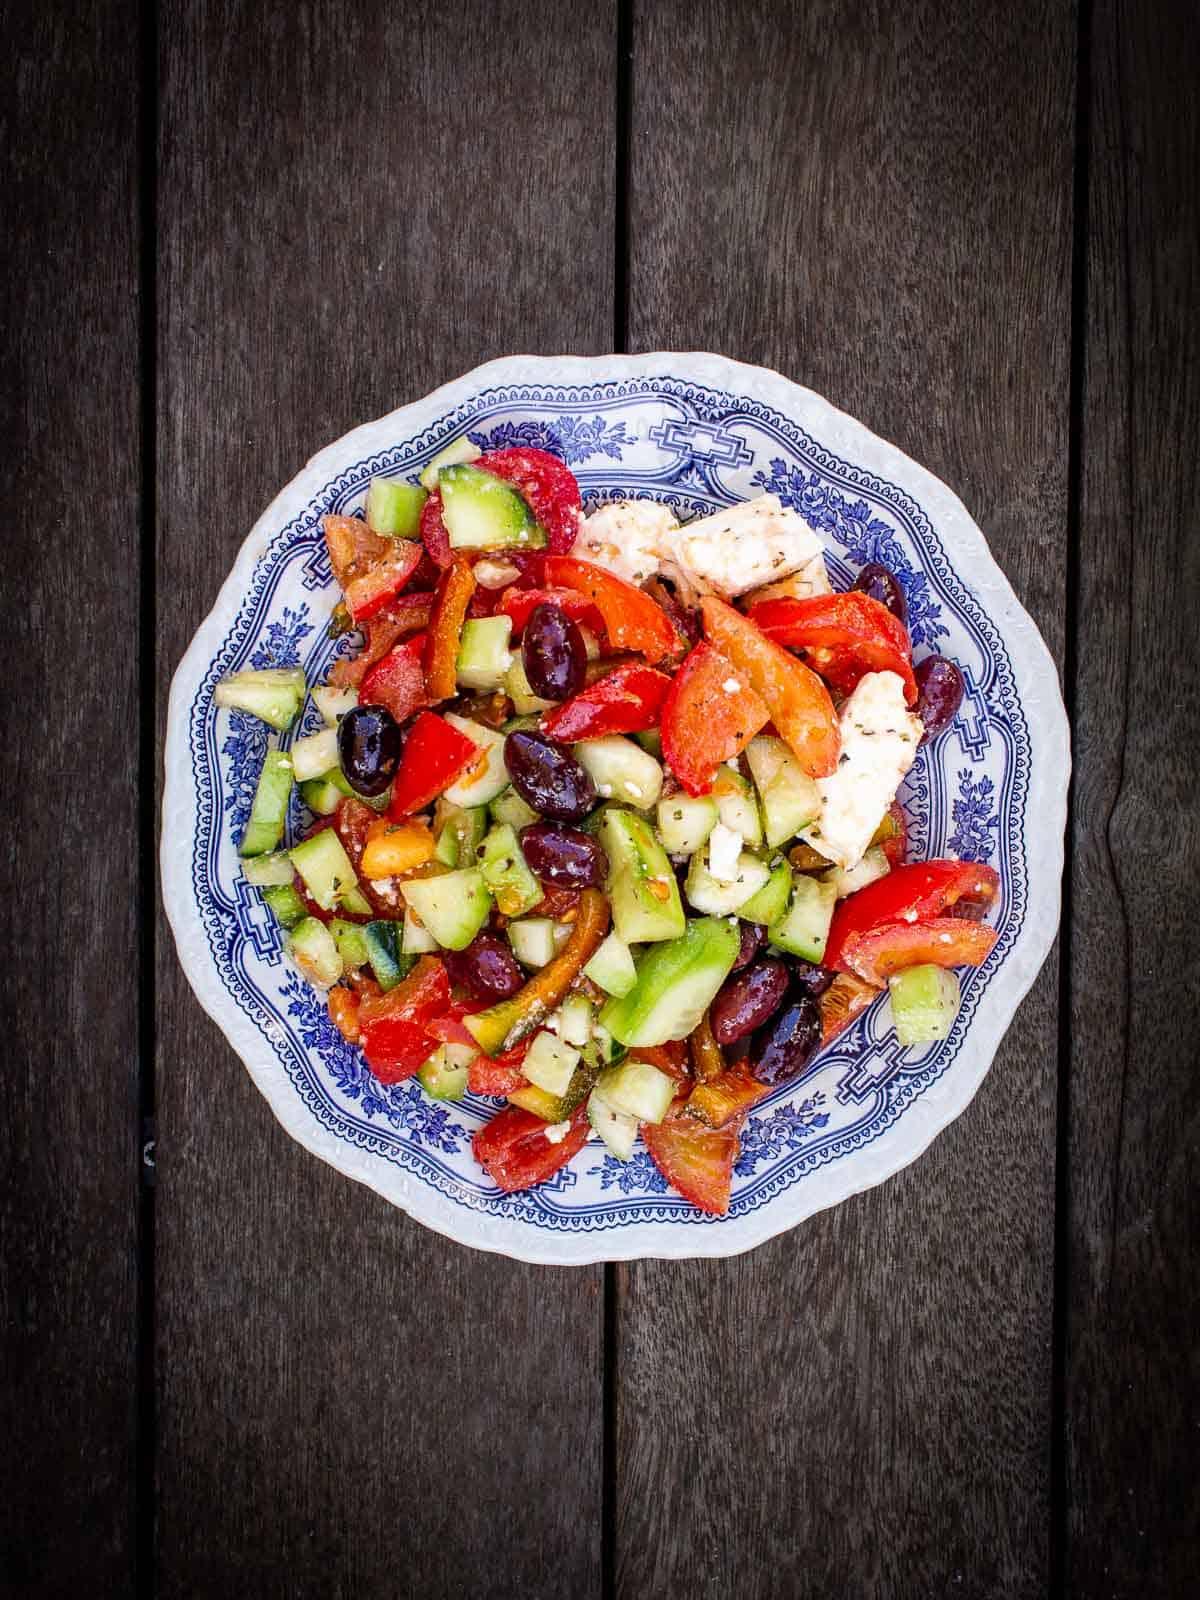 Greek Salad in wood table